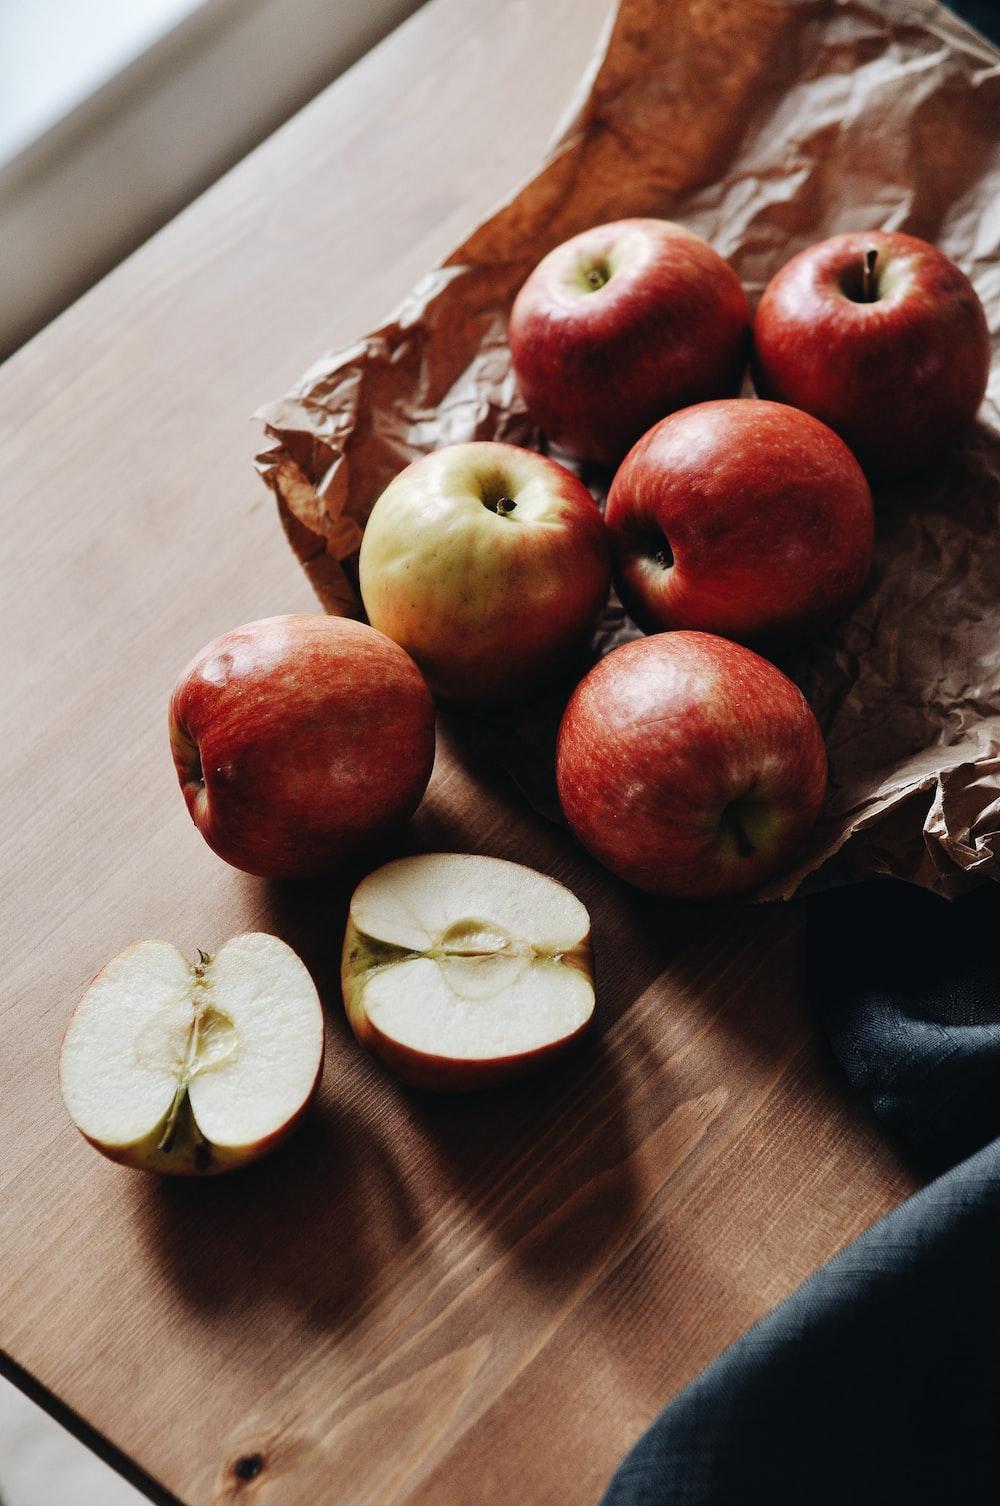 red apples and sliced lemon on brown paper bag